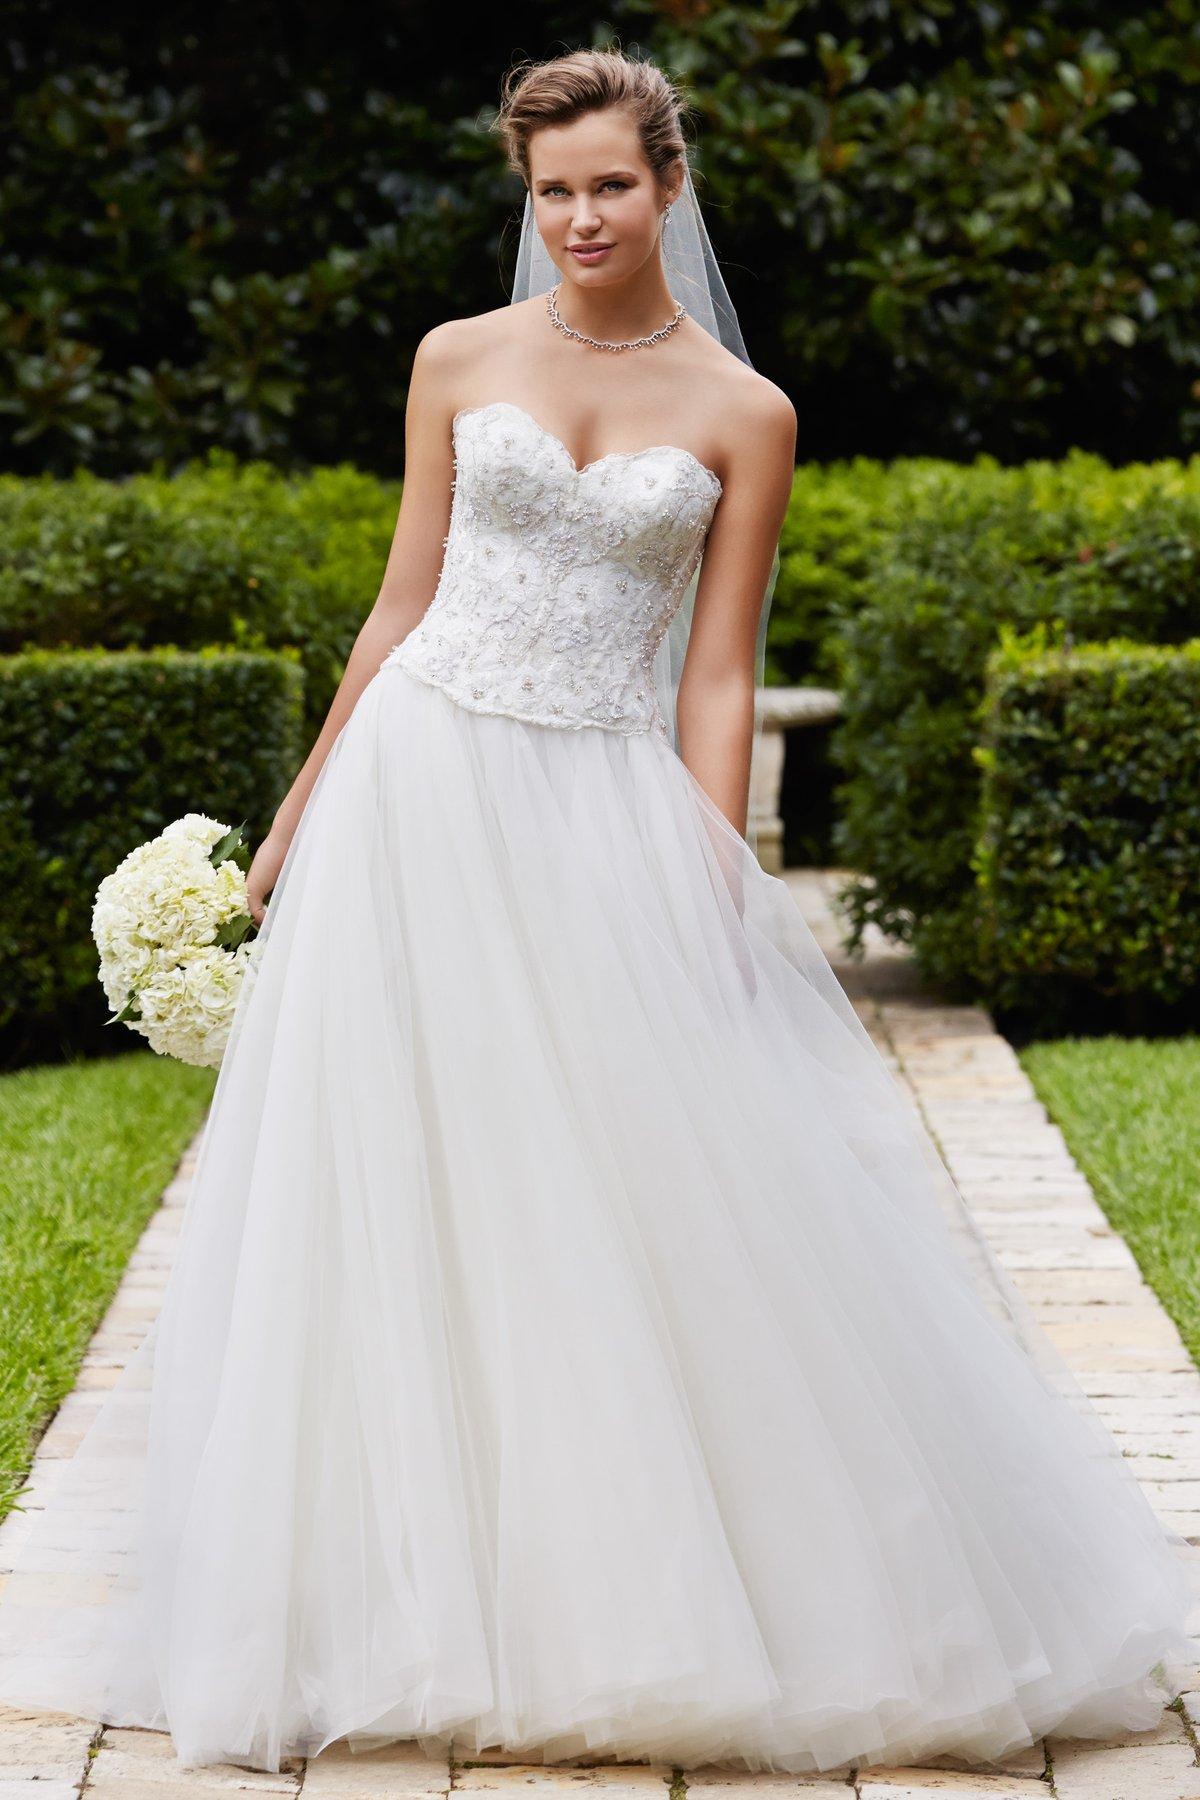 Sweetheartneck Beaded Ballgown Wedding Dress: Ball Gown Wedding Dresses Spring At Websimilar.org